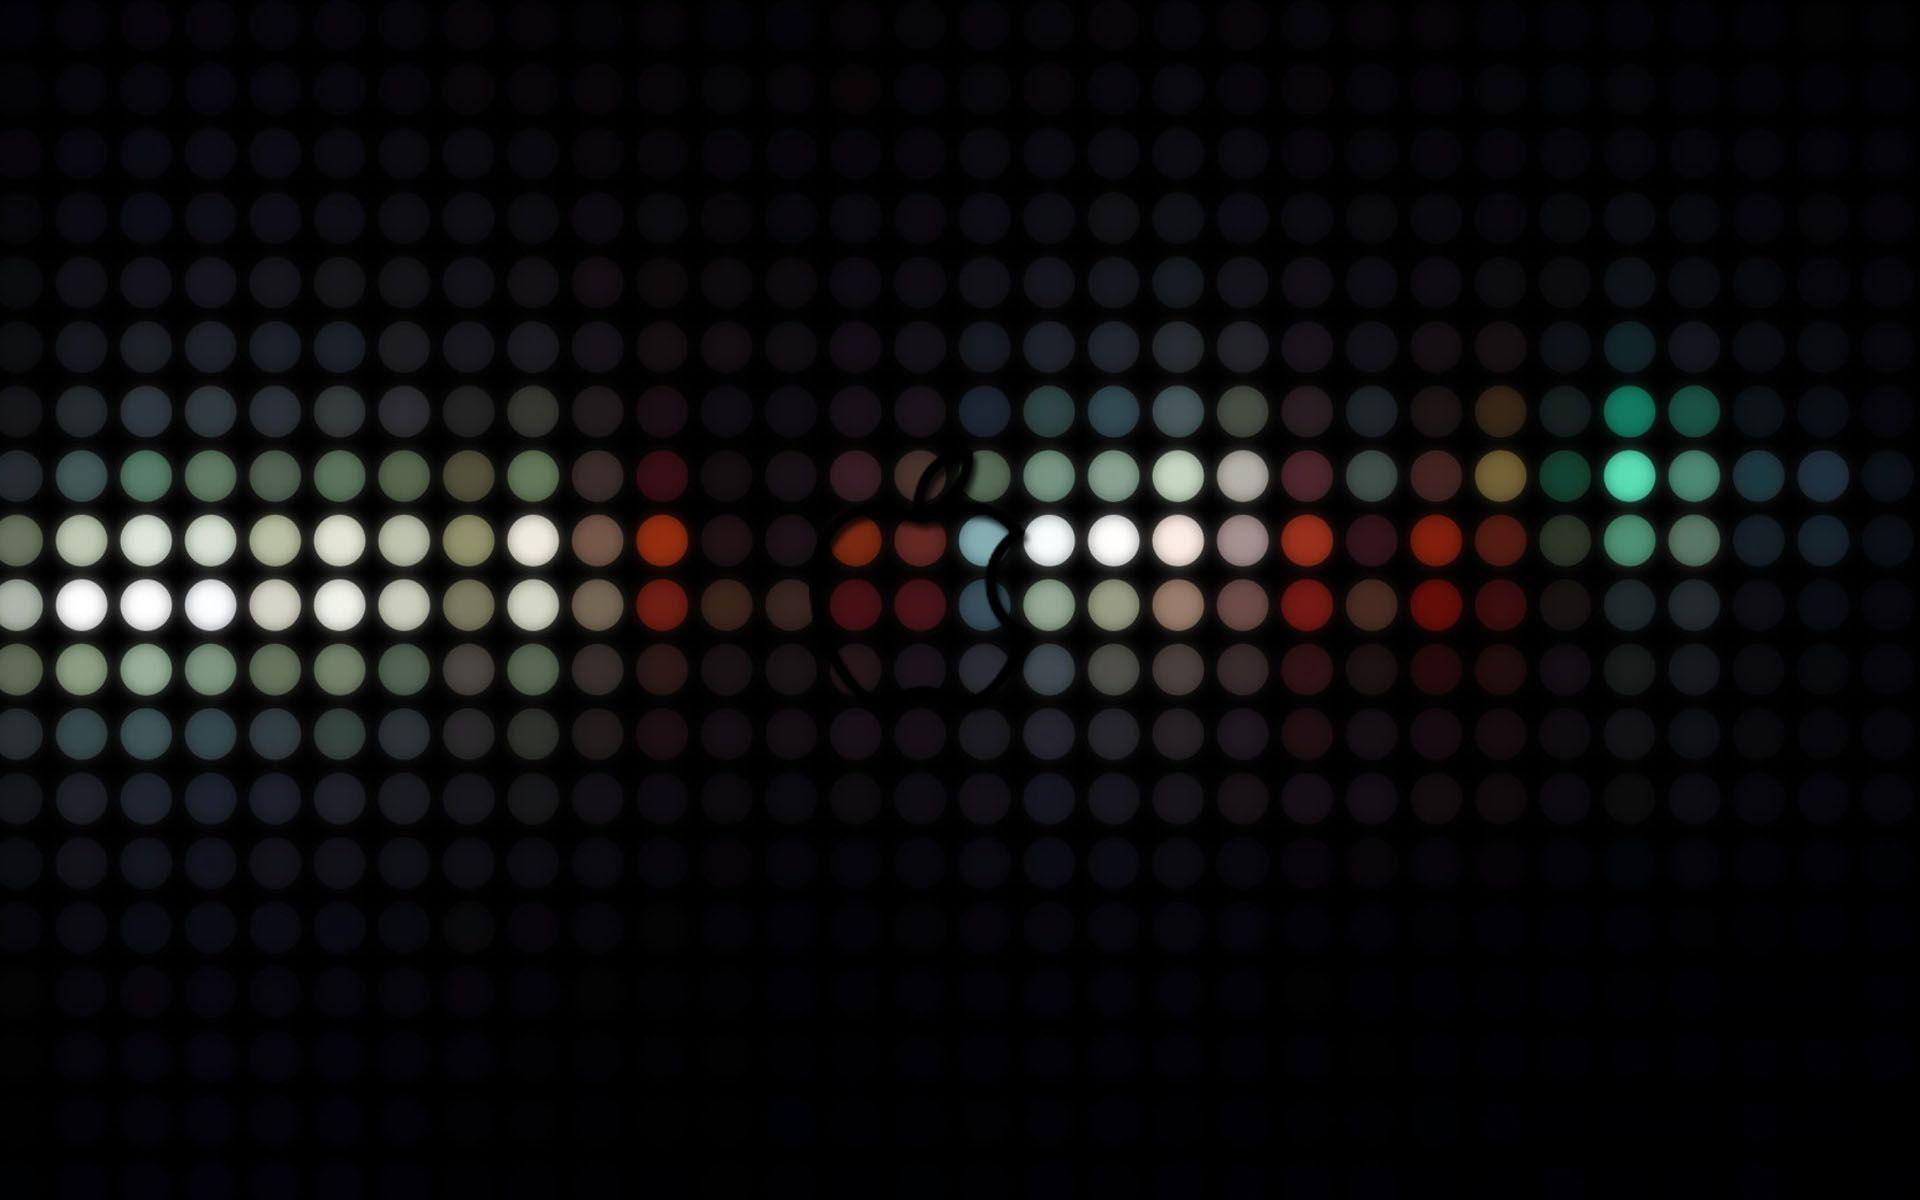 Beautiful Wallpaper Mac Music - b6475adefd5731d1bac5f752c48c2374  Gallery_518186.jpg